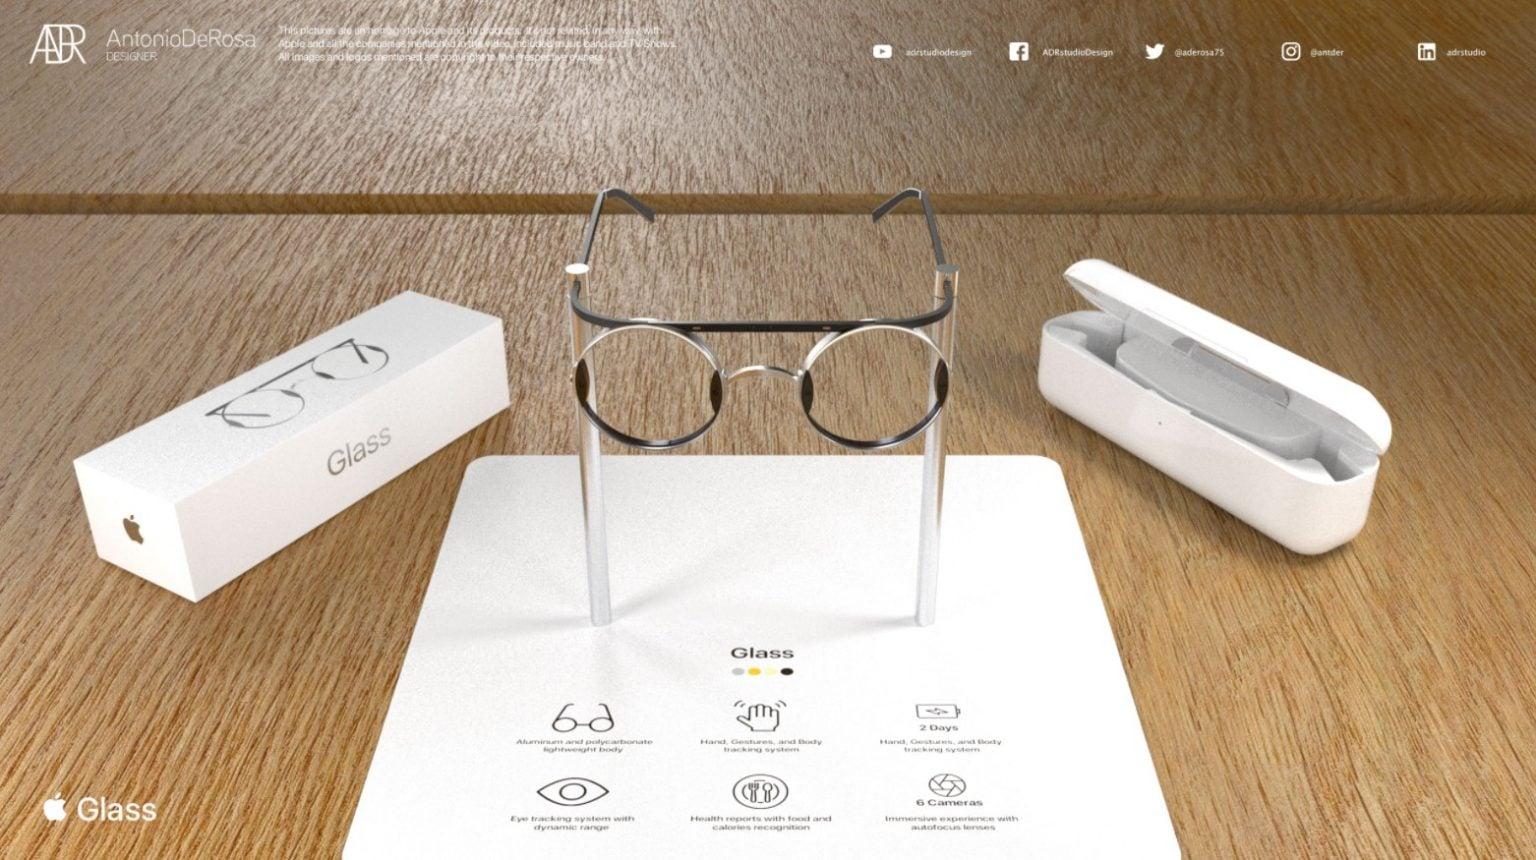 Designer Antonio De Rosa's concept for Apple Glass is complete.